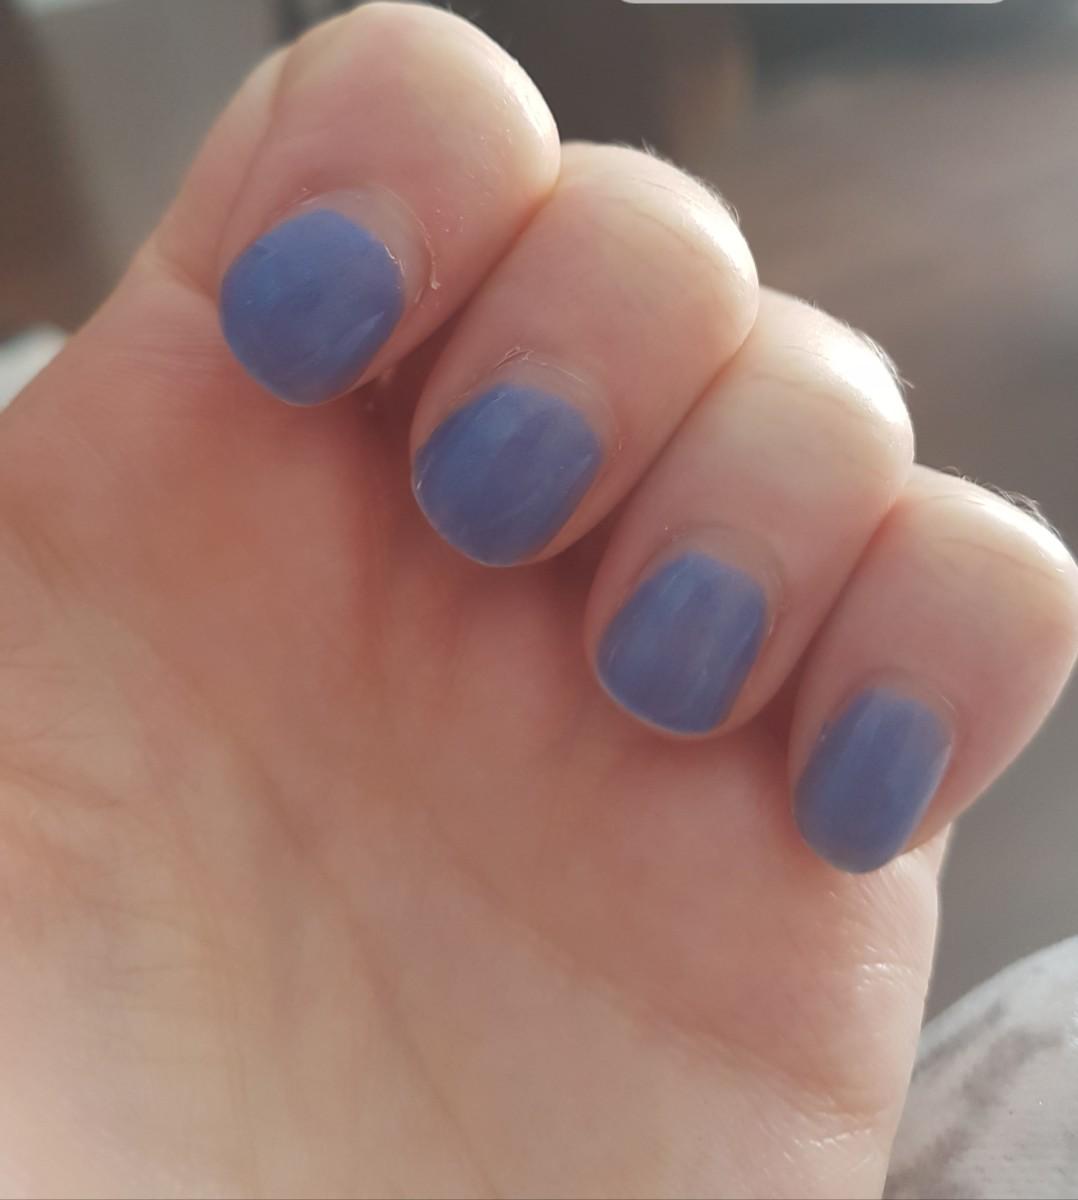 Beginner's Guide for DIY Gel Nails